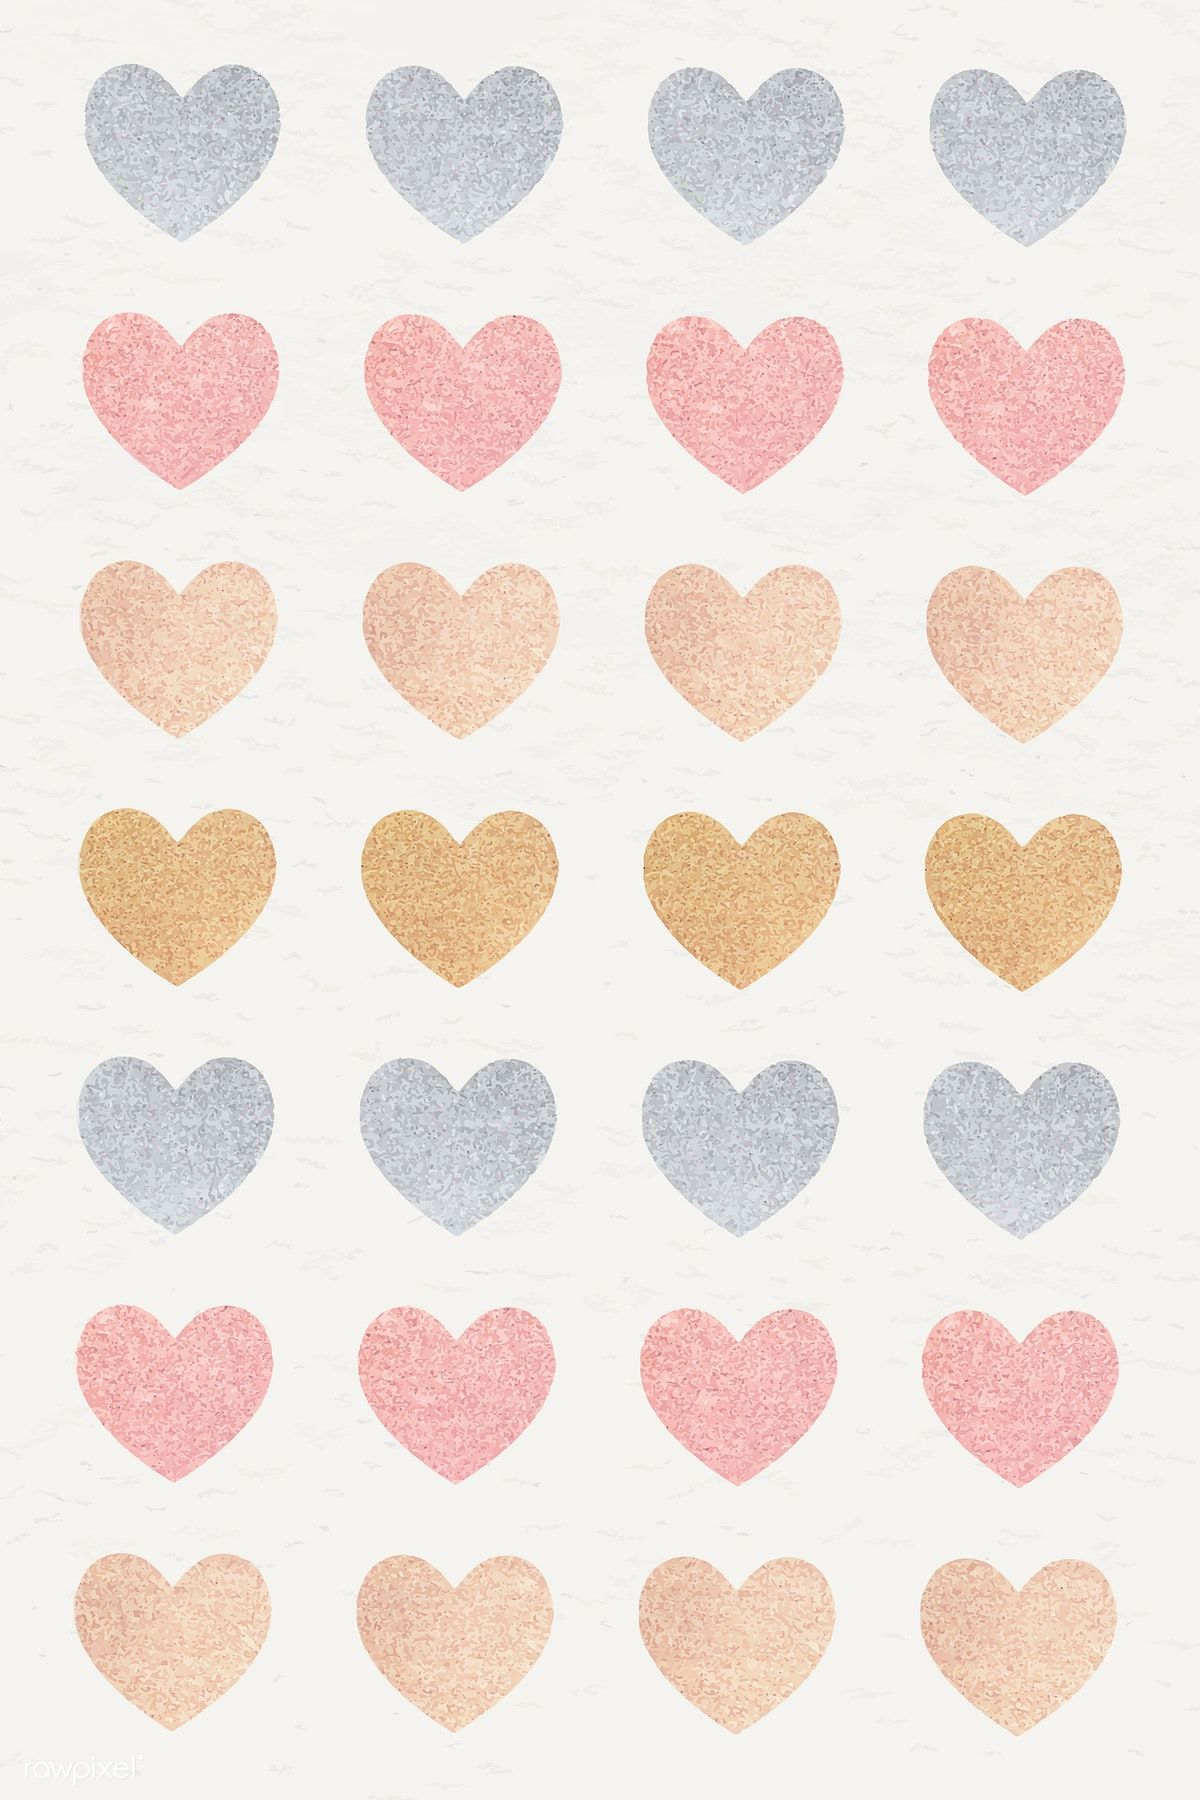 Glitter heart sticker set vector free image by rawpixel